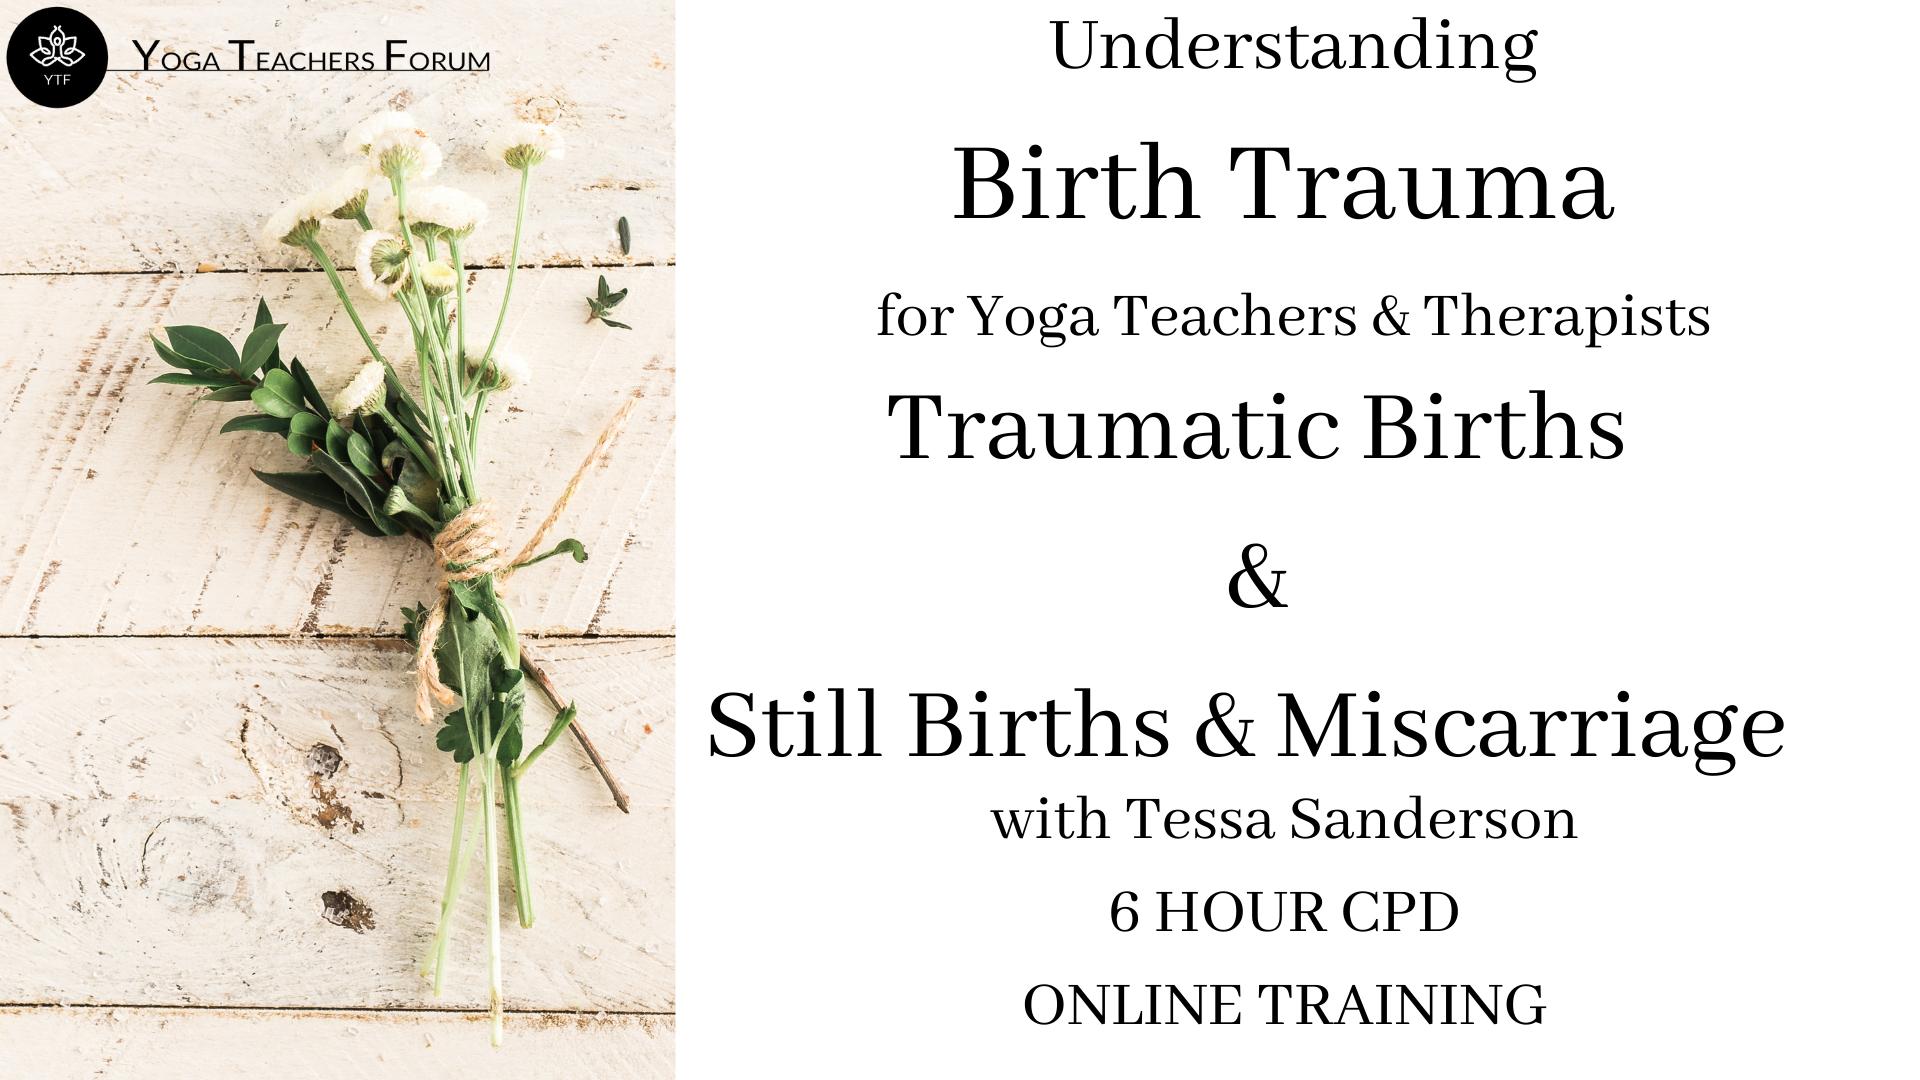 Birth Trauma for Yoga Teachers & Therapists-7